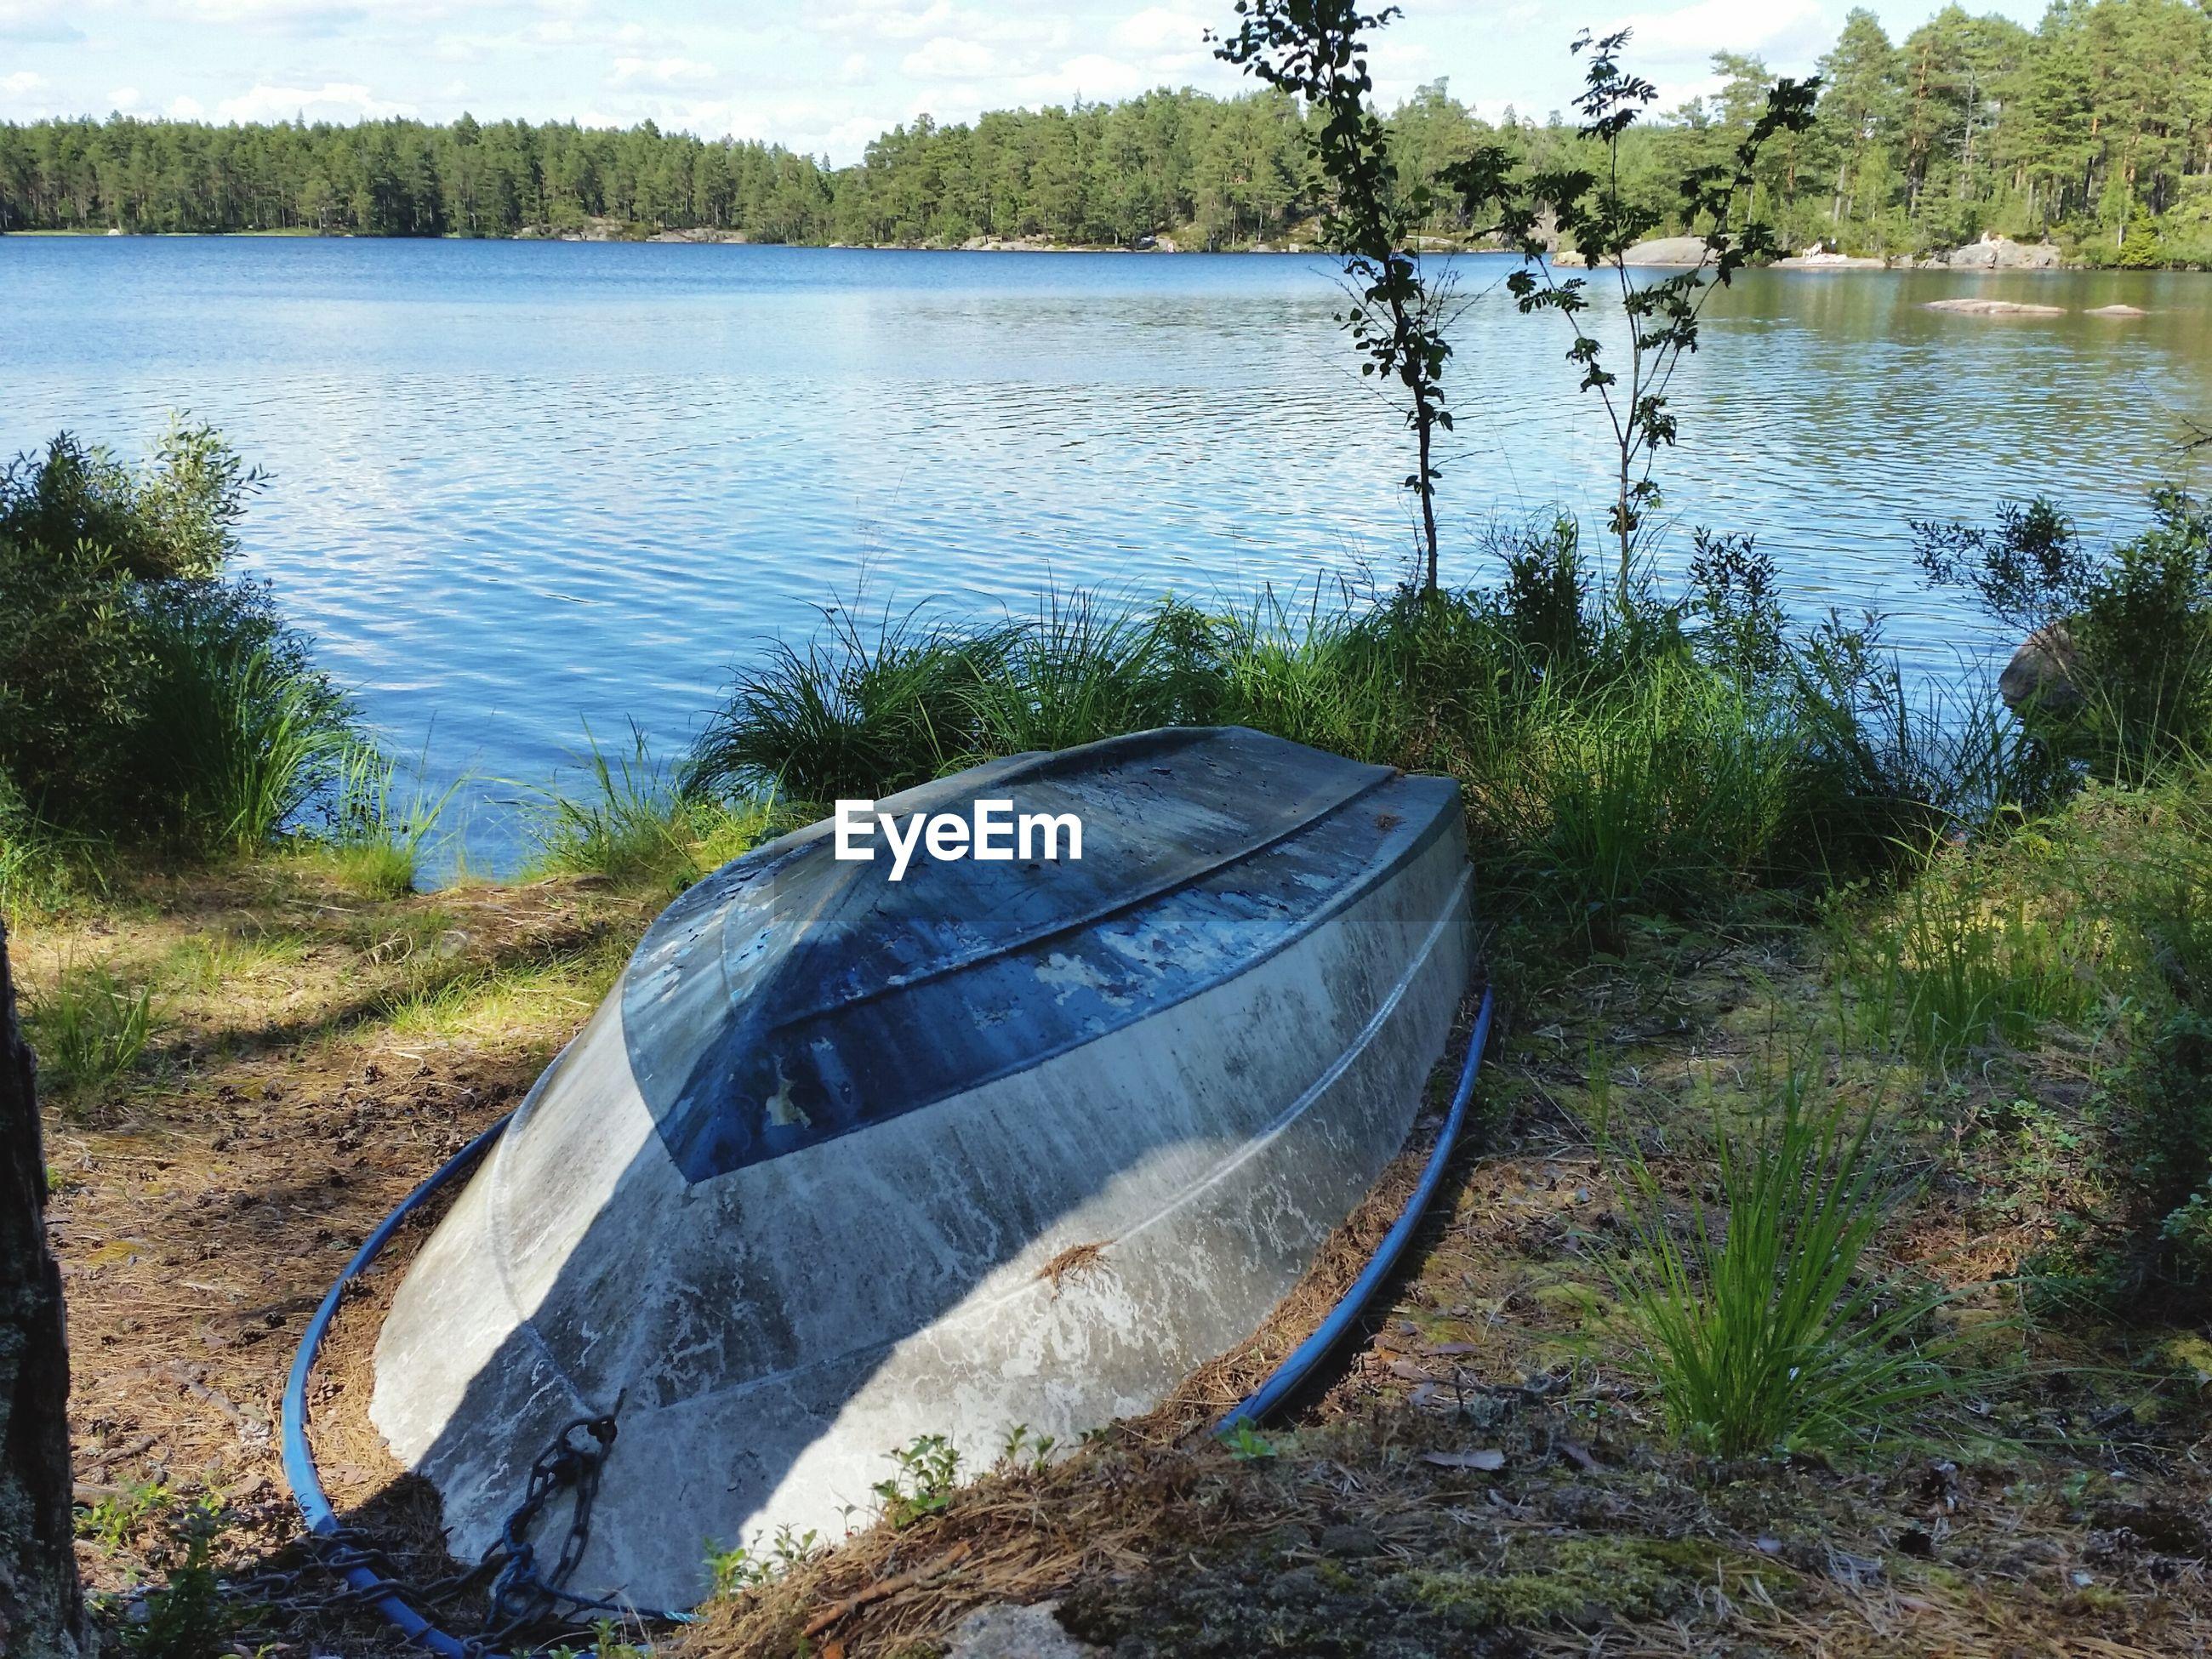 Upside down boat of lakeshore